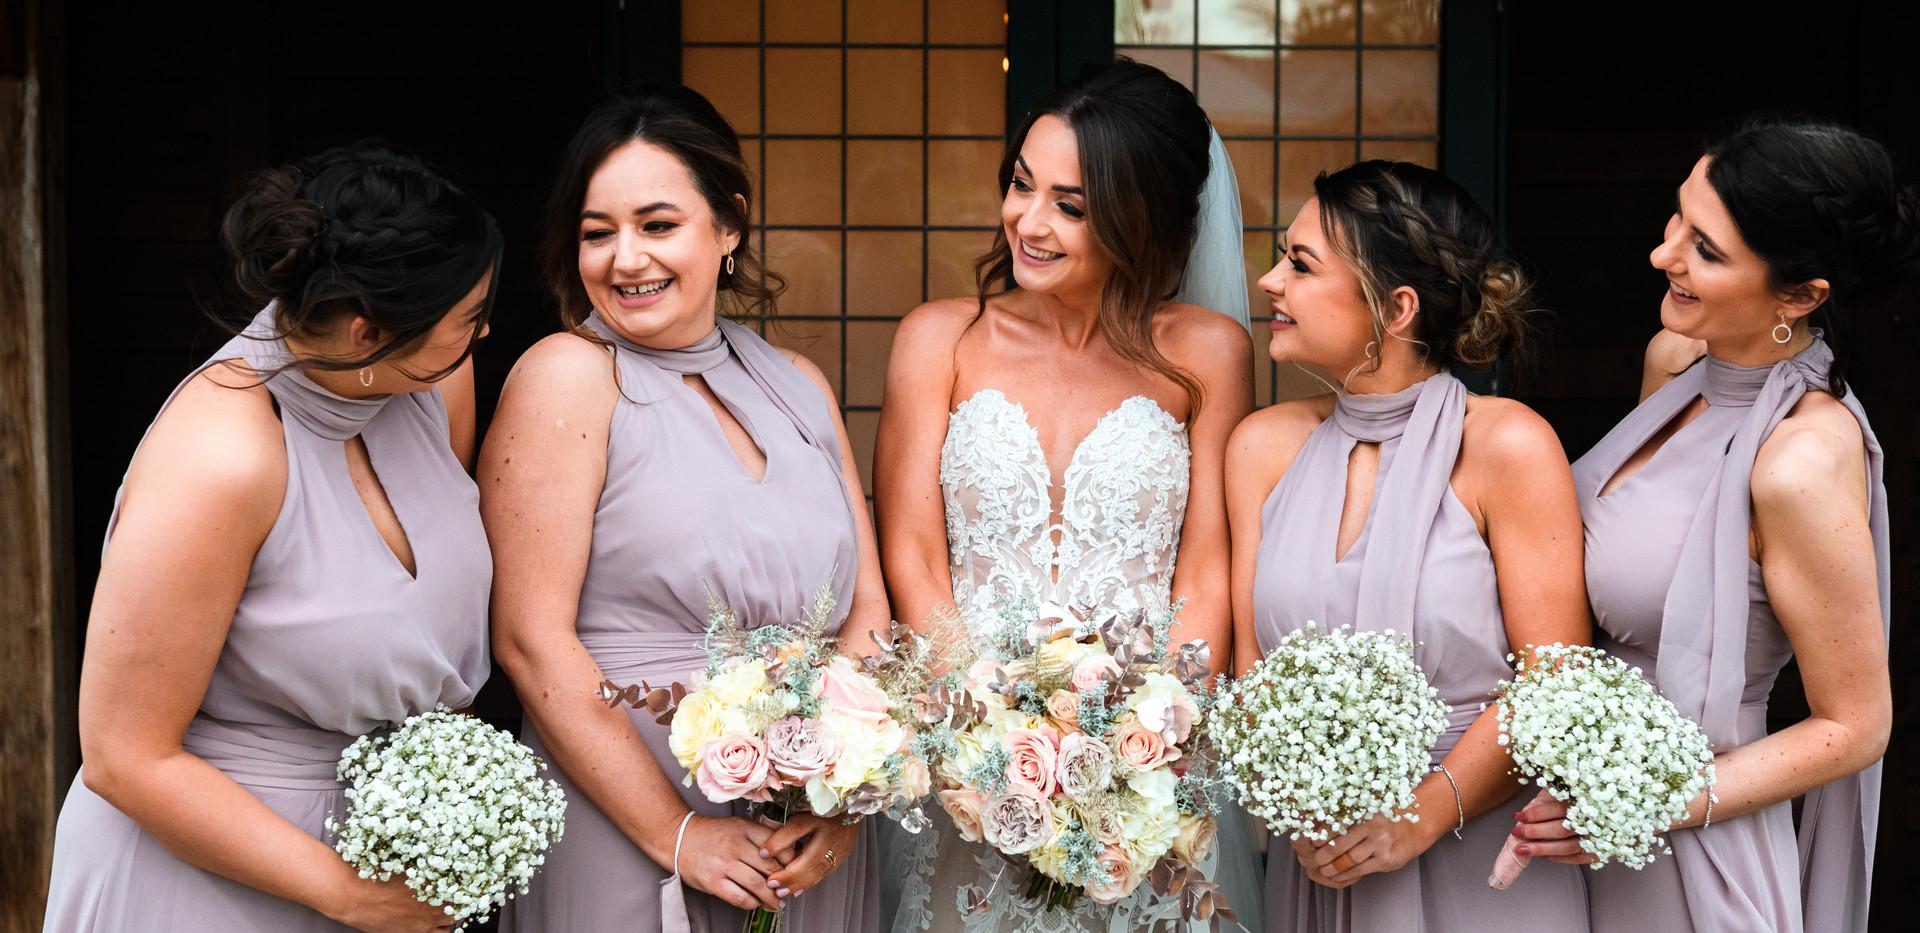 Colshaw Hall Wedding Cheshire Photograph